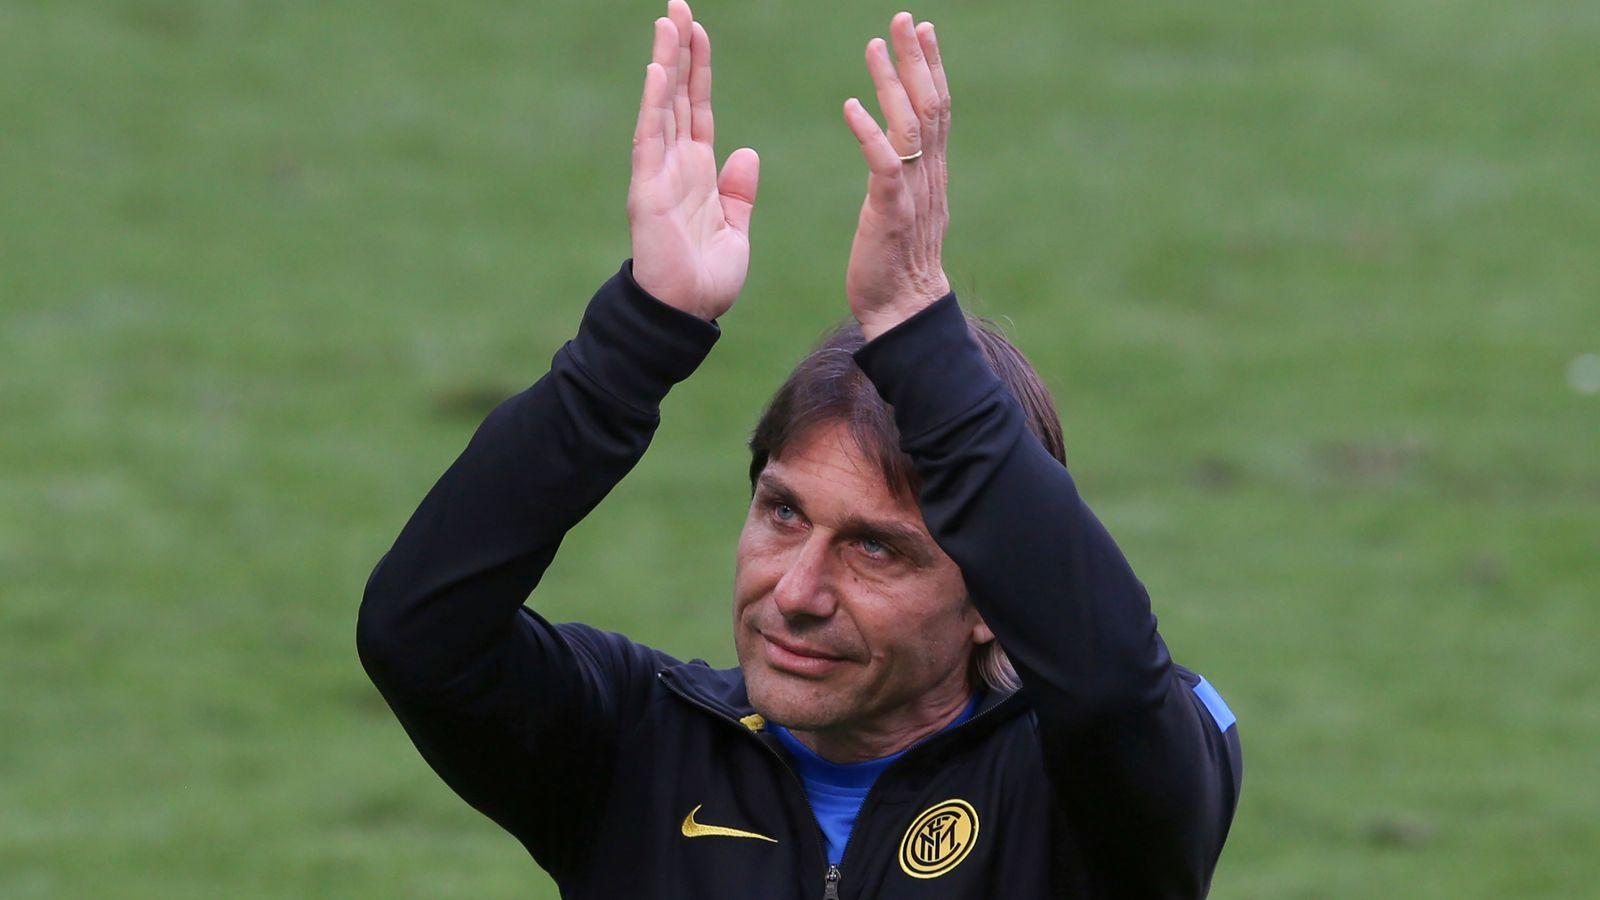 Tottenham in talks with Antonio Conte and eye Fabio